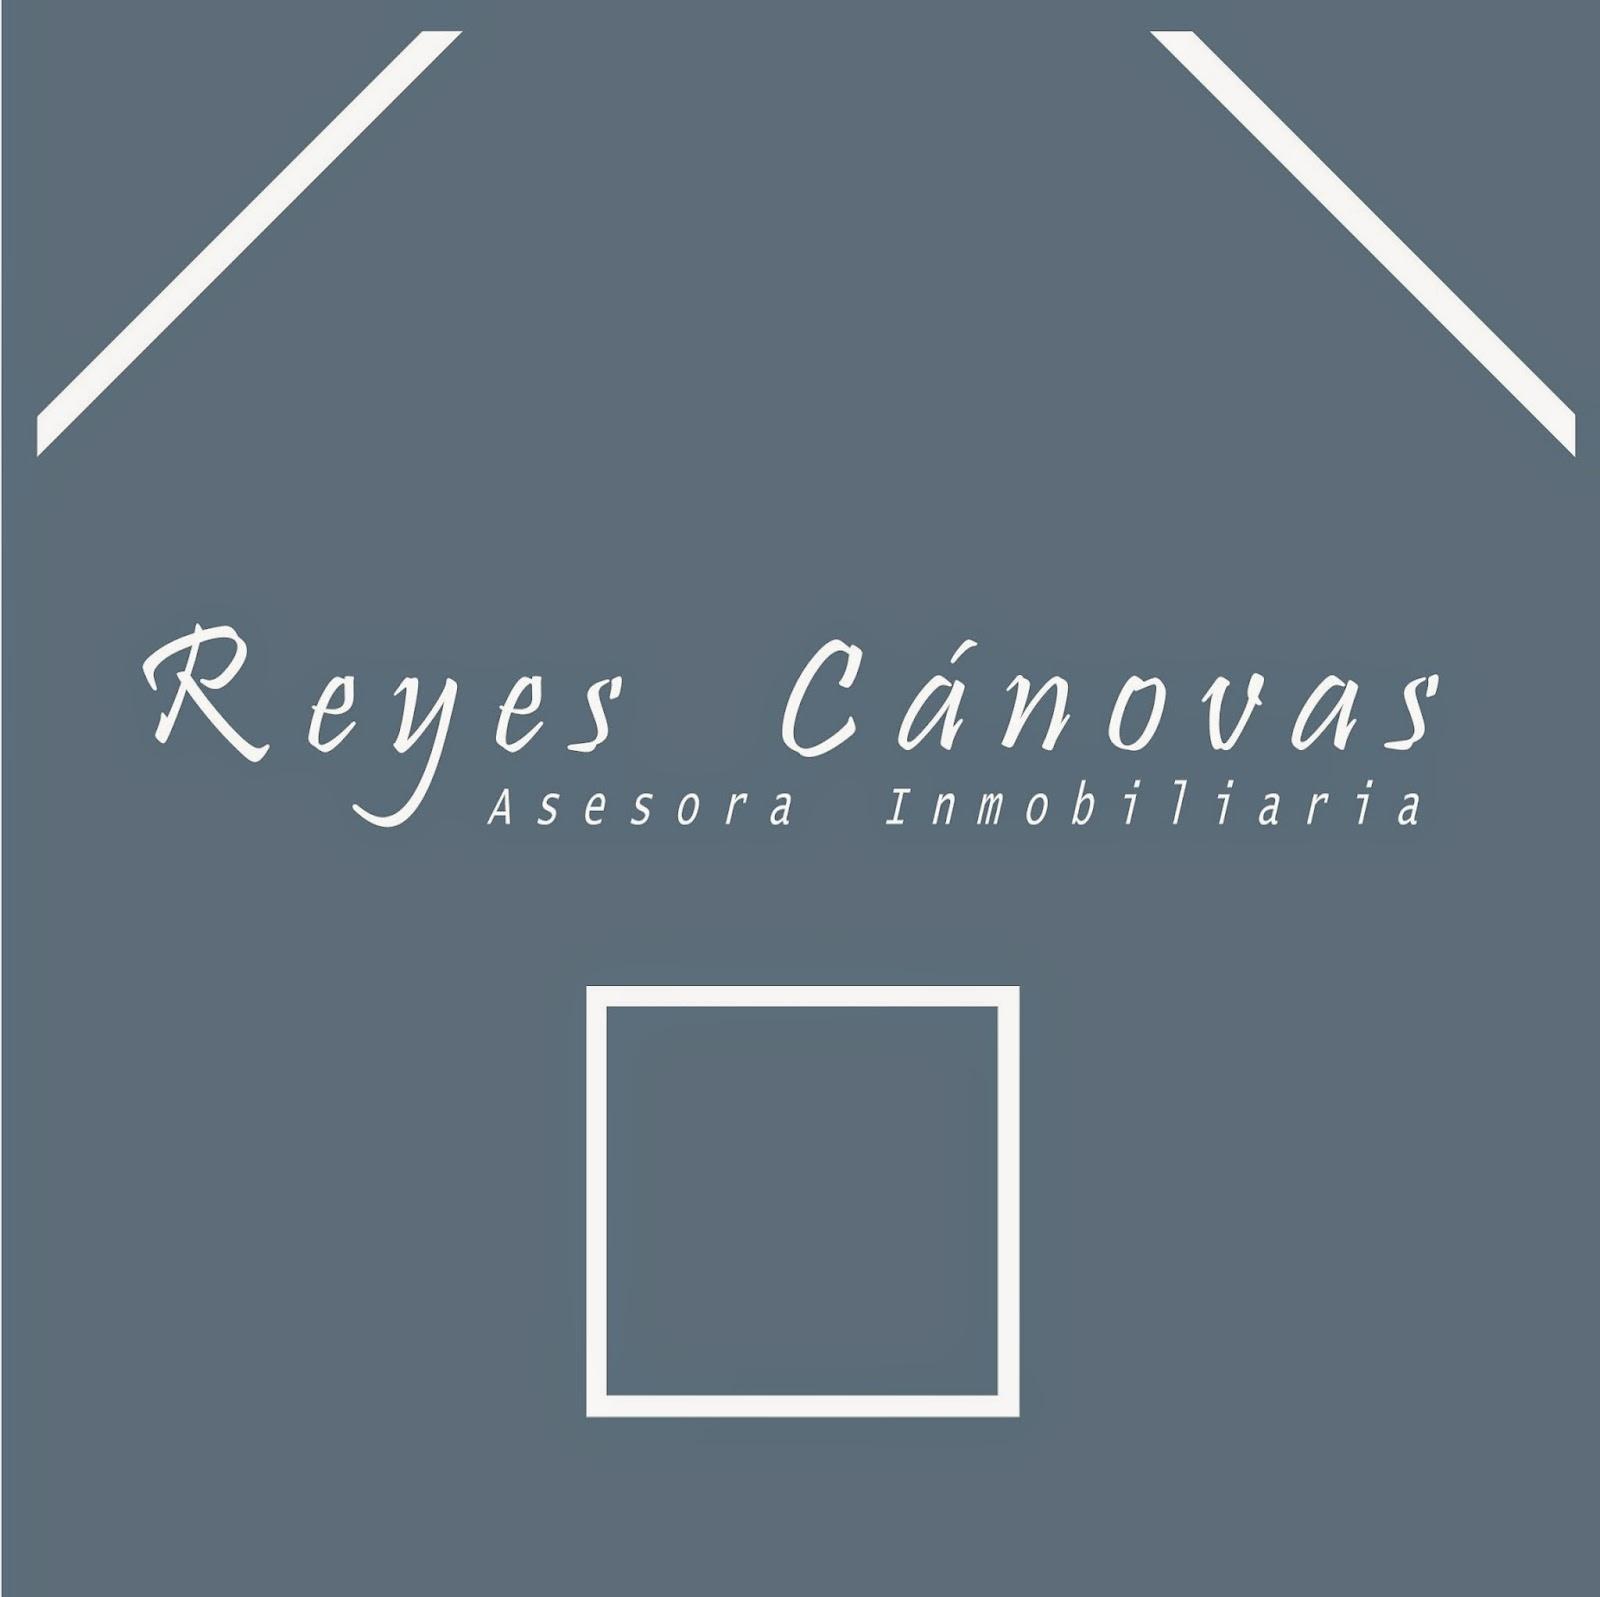 http://europaschoollinks.blogspot.com/2014/12/reyes-canovas-asesora-inmobiliaria.html